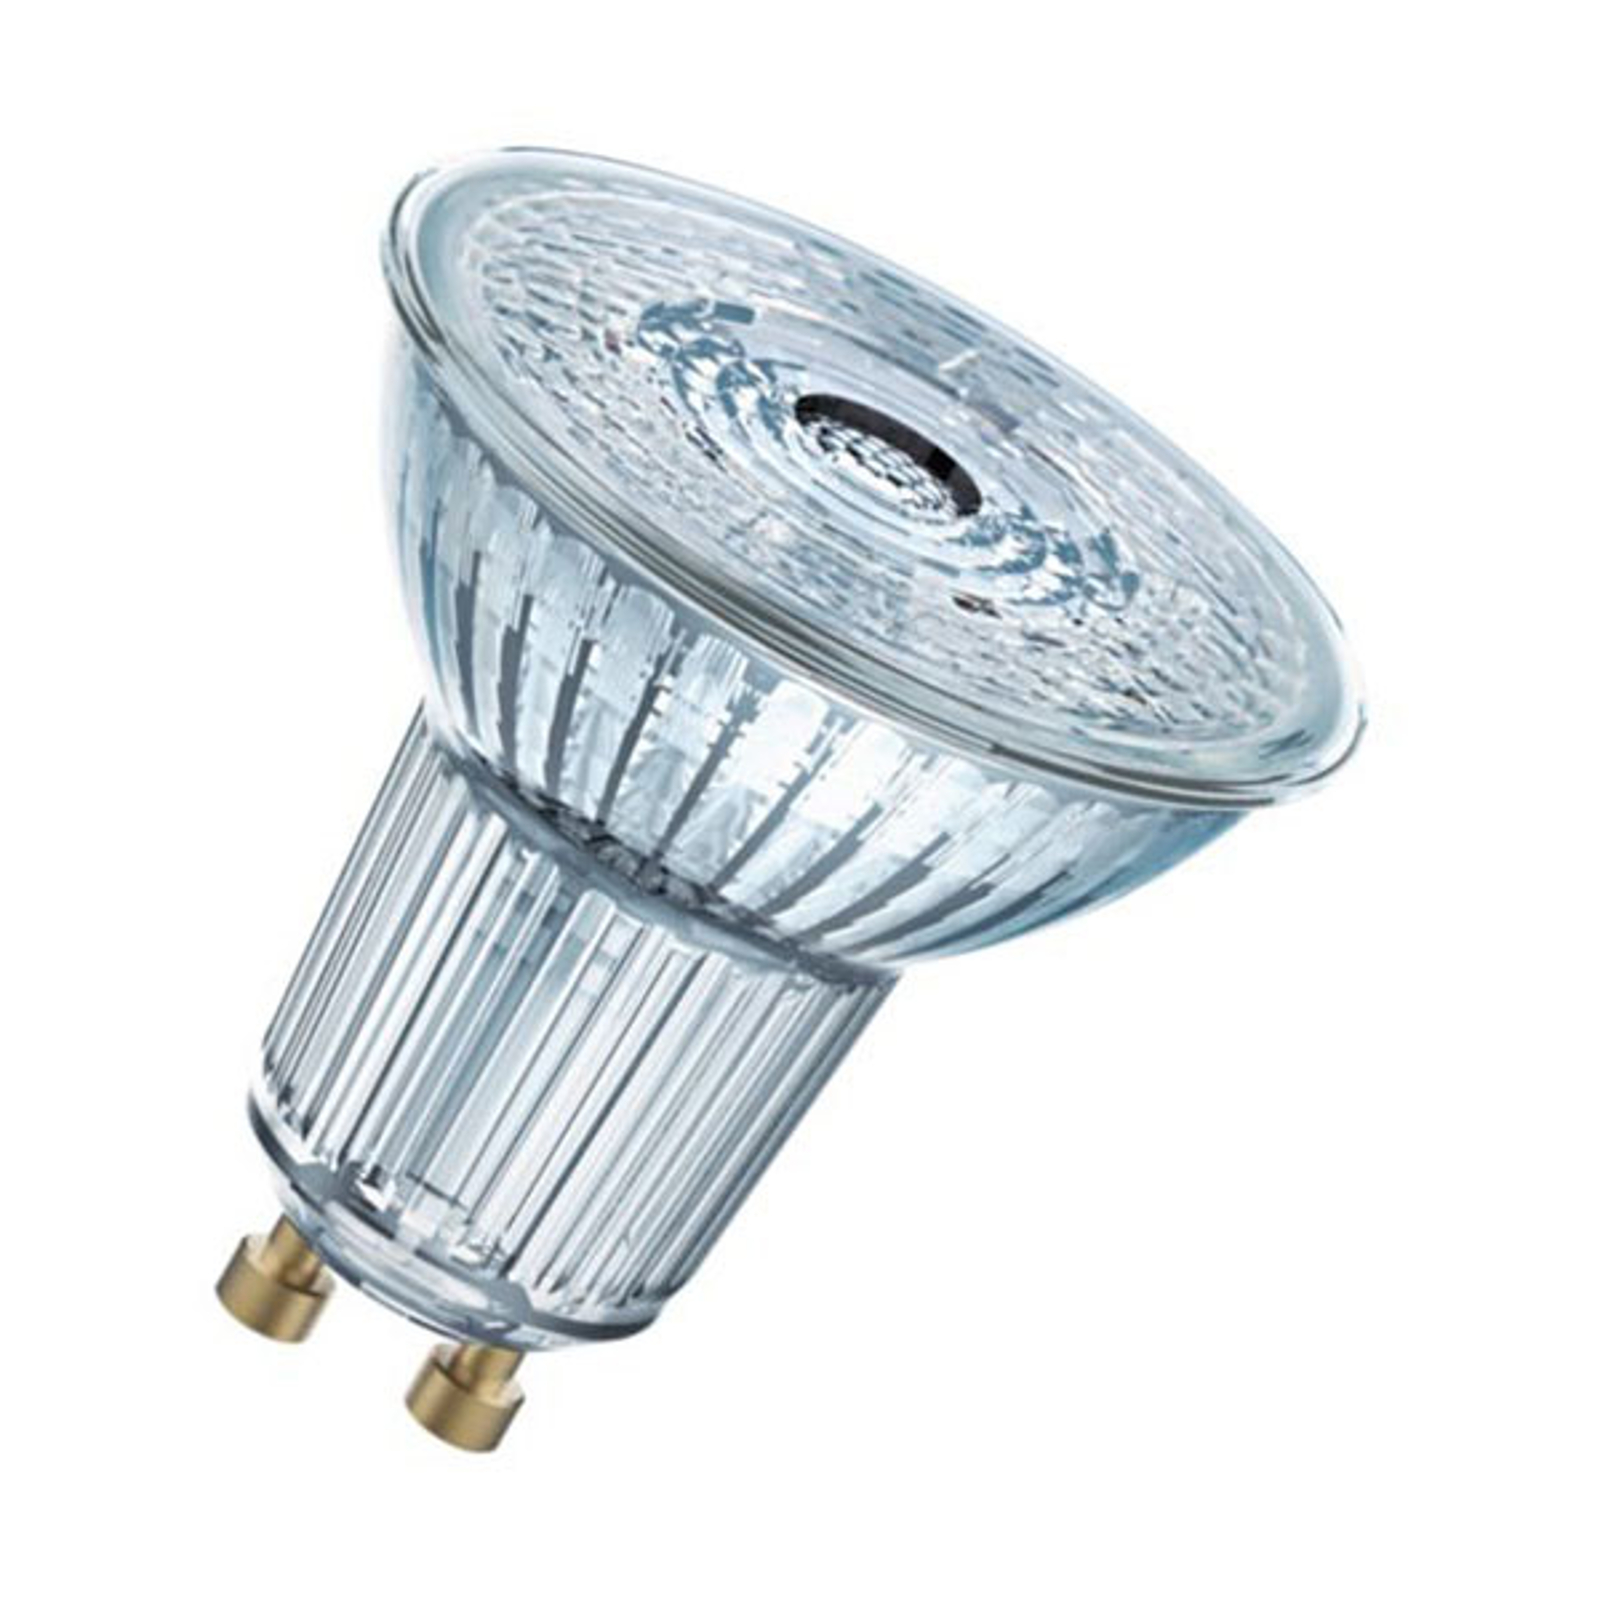 OSRAM szklany reflektor LED GU10 8,3W 940 36°